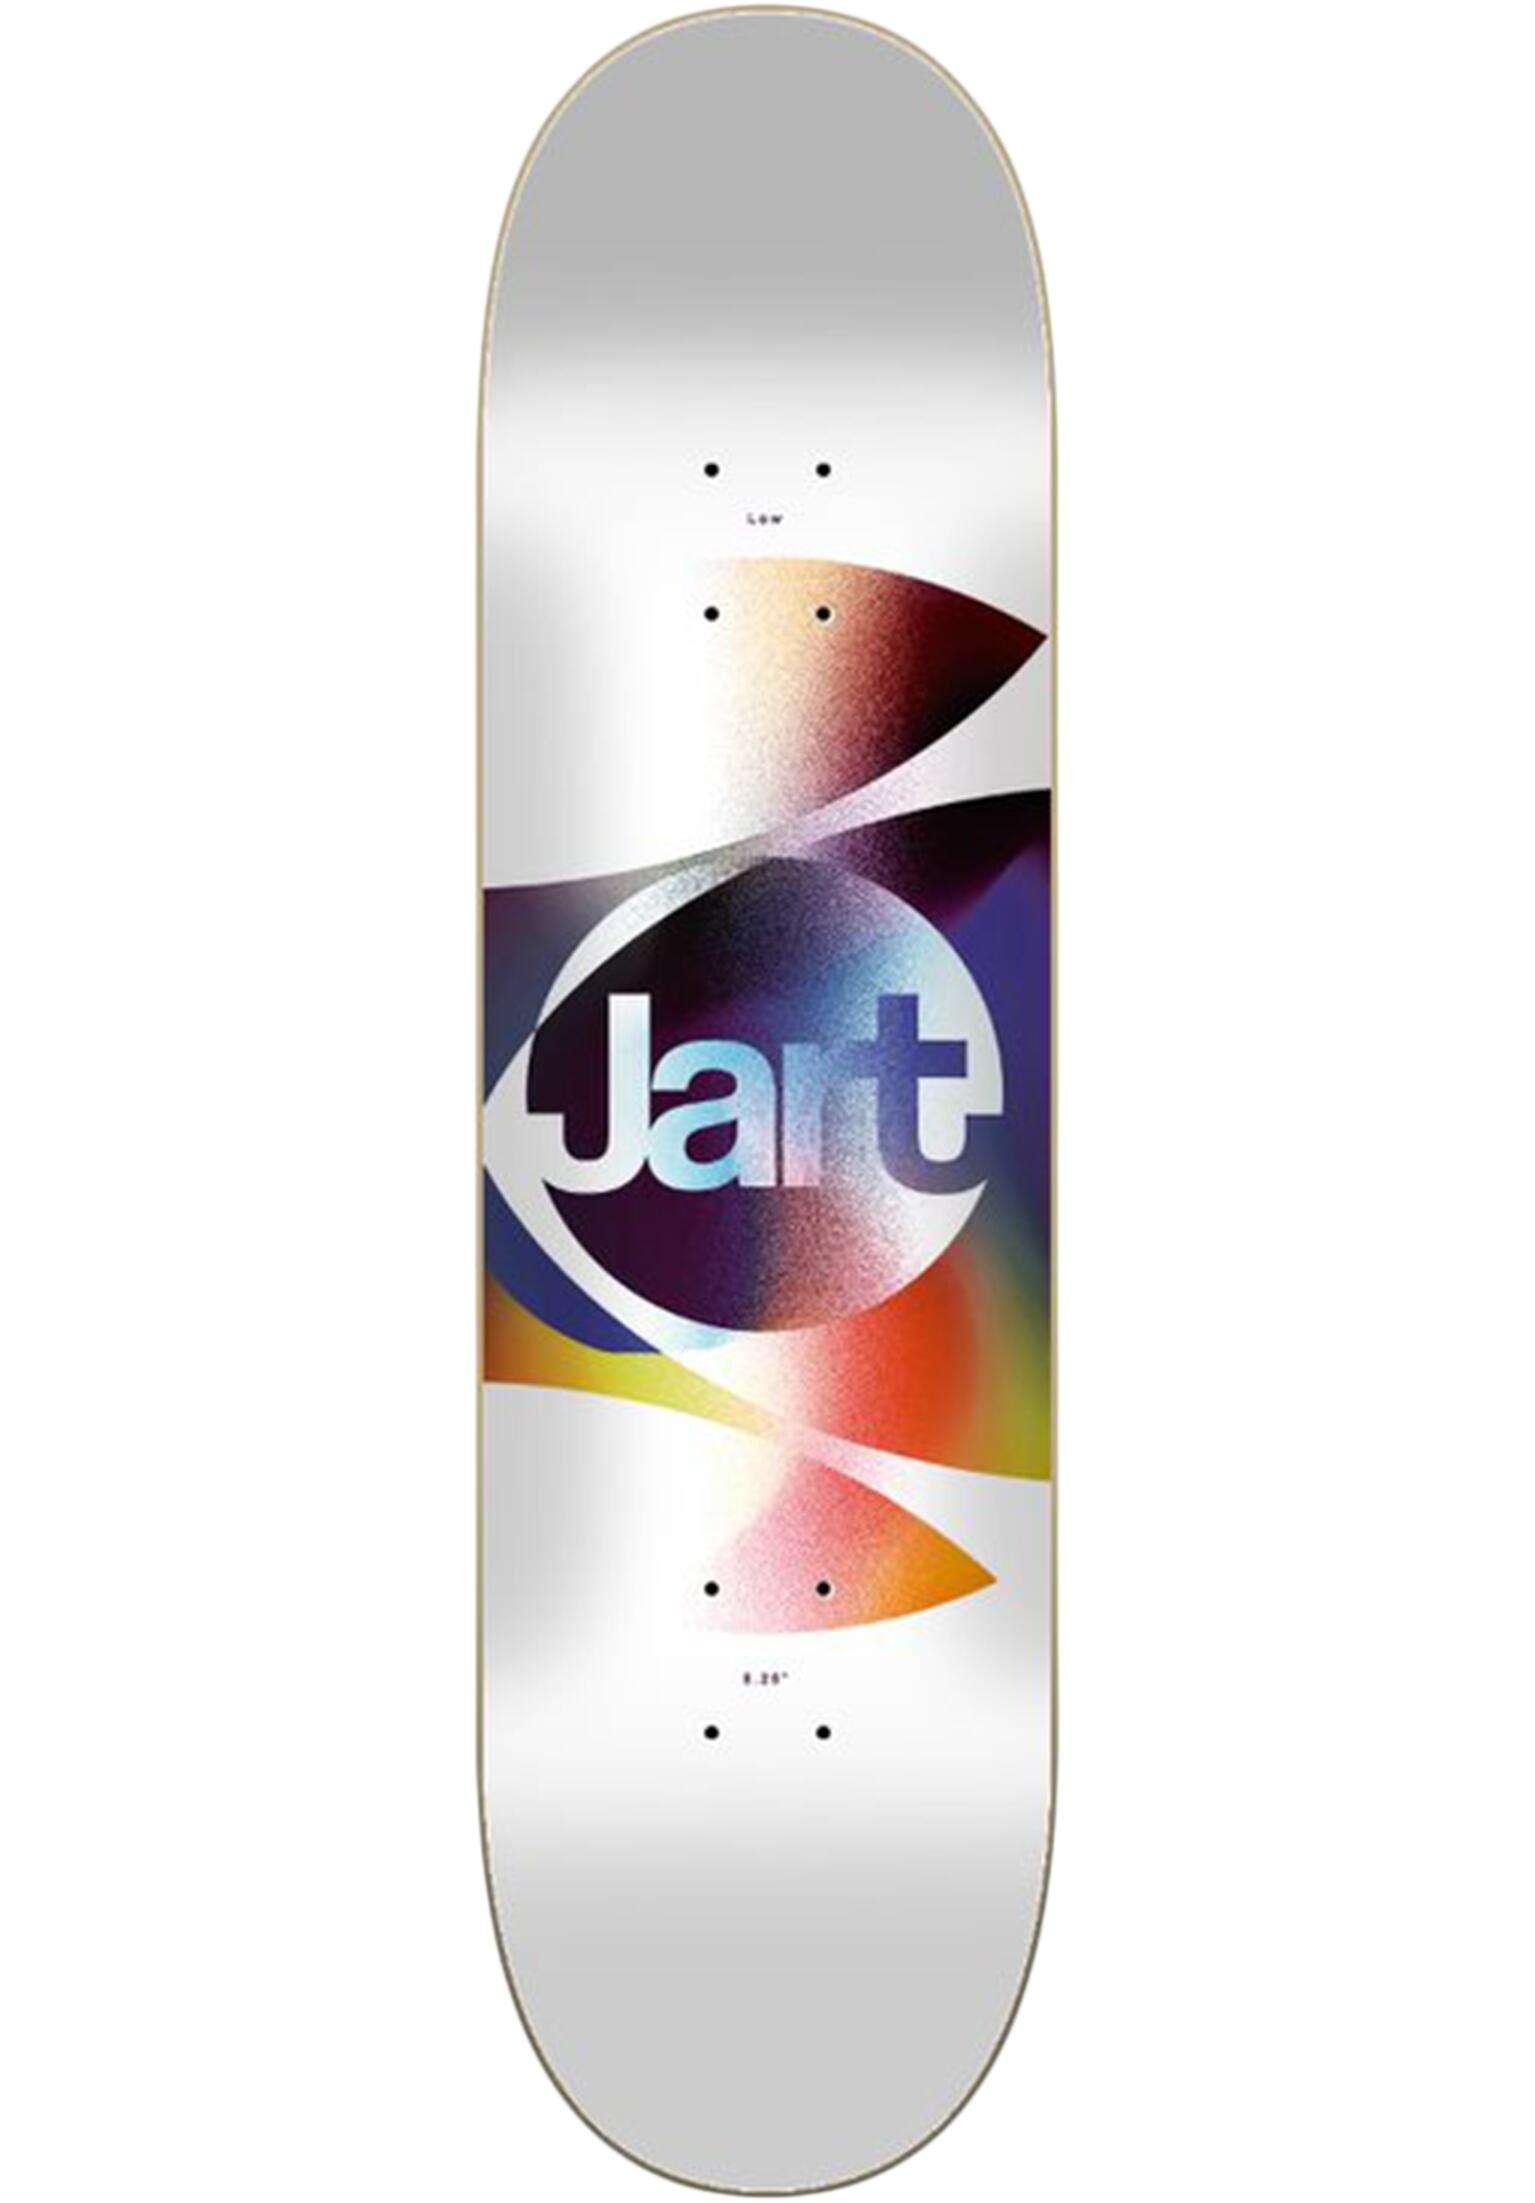 Jart Wallpaper